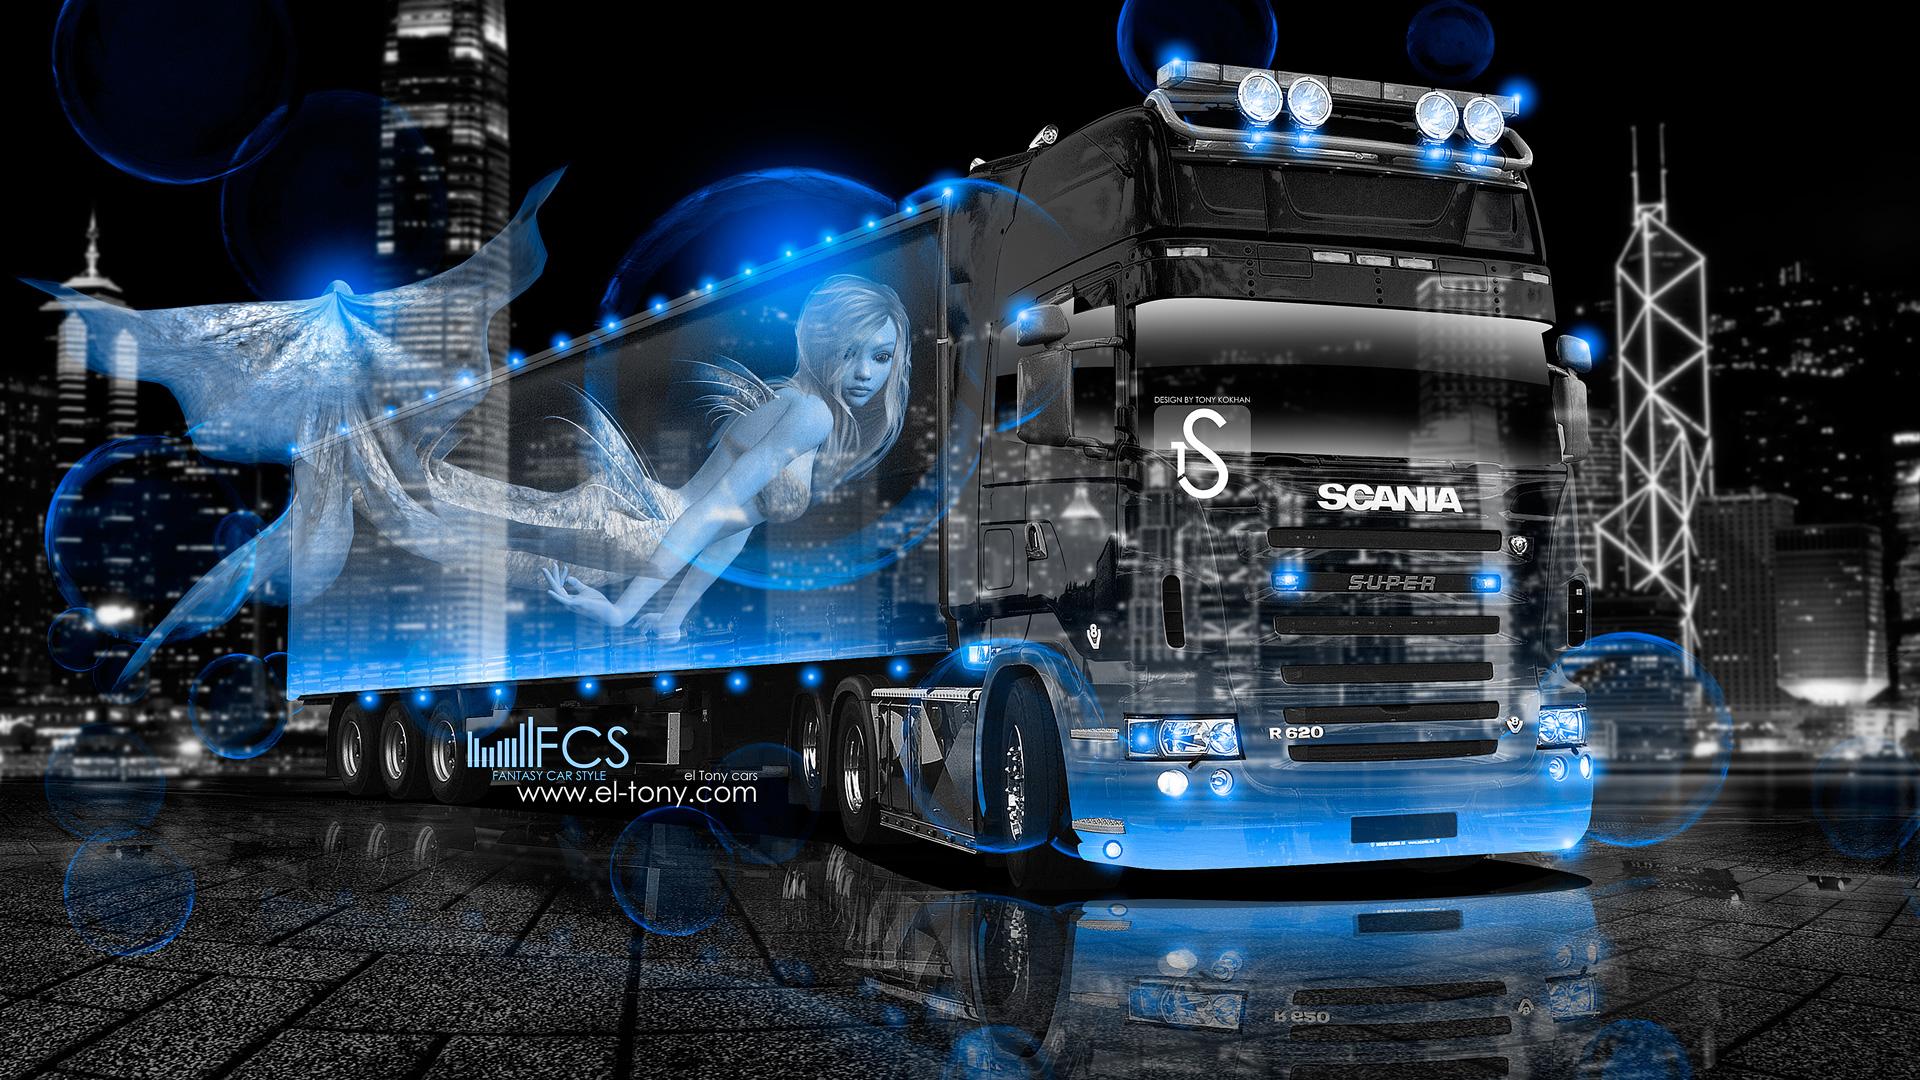 Scania Wallpaper Hd Scania Truck Wallpaper Hd 196614